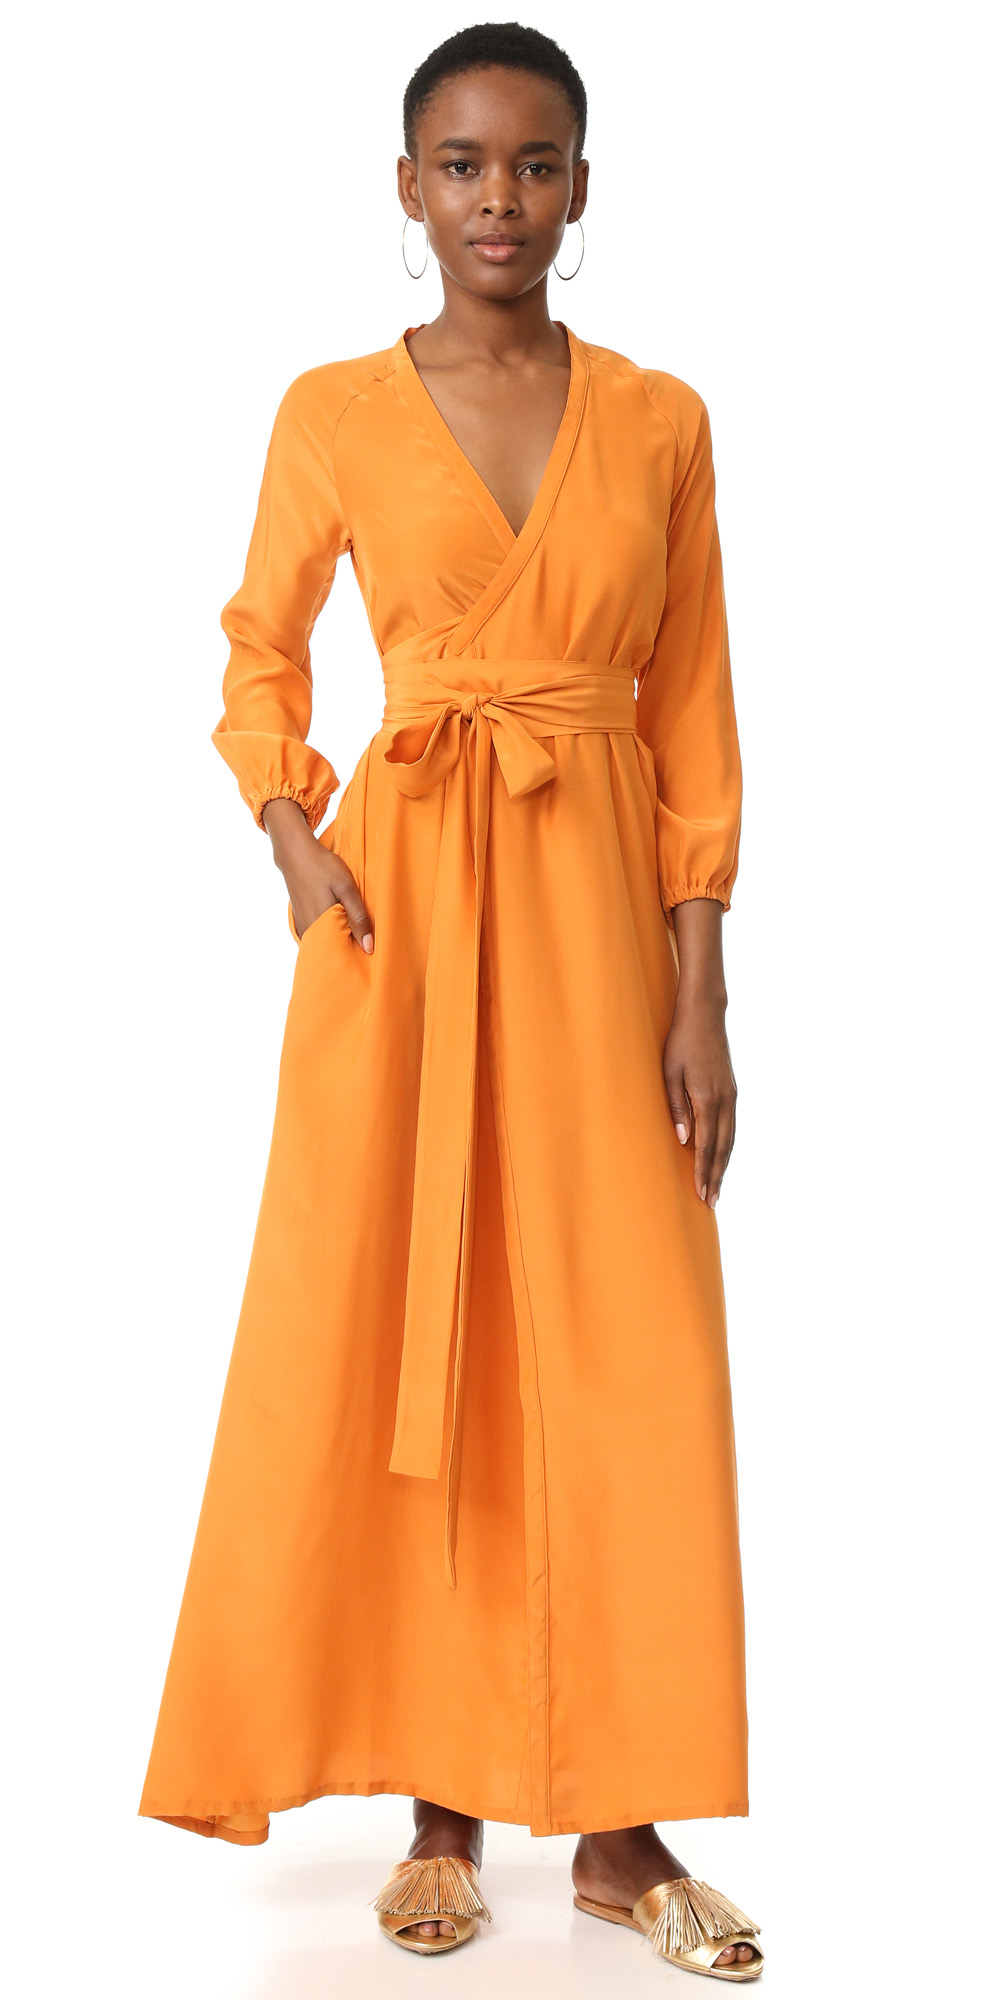 orange-dress-wrap-maxi-tan-shoe-sandals-hoops-brun-spring-summer-weekend.jpg